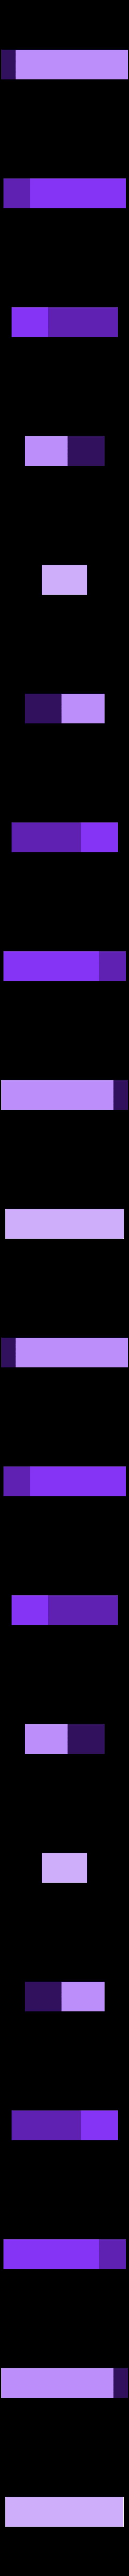 blue.stl Download STL file MMU QR code • 3D printing object, DoubekDesign